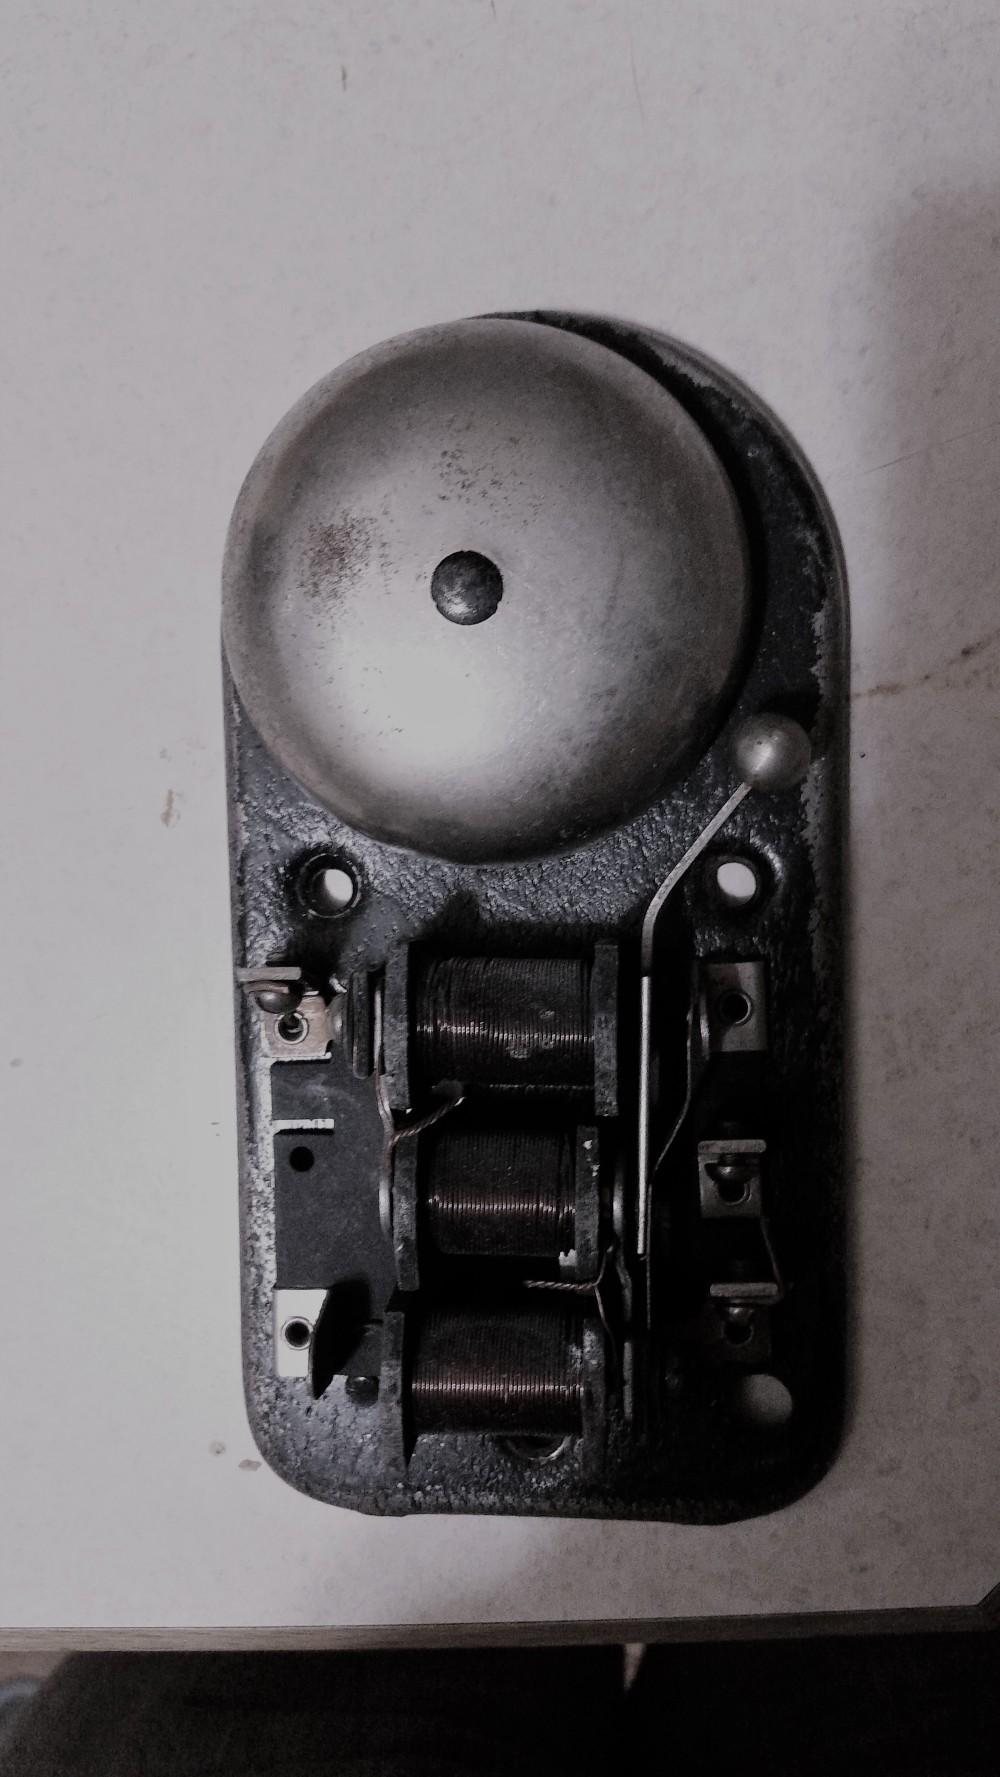 phone photos 216 (2)